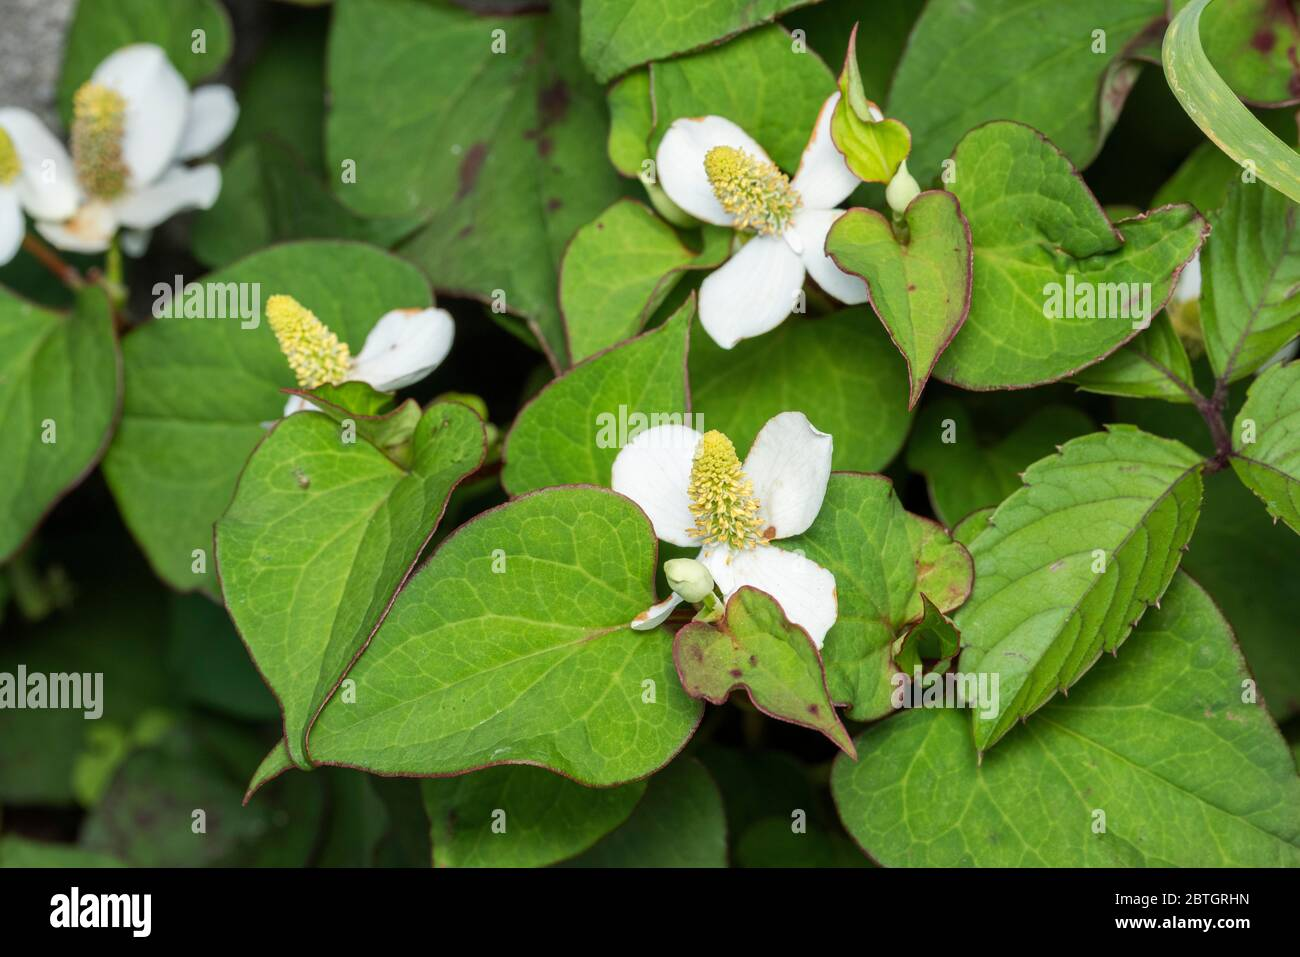 Flower of fish mint (Houttuynia cordata), Isehara City, Kanagawa Prefecture, Japan Stock Photo